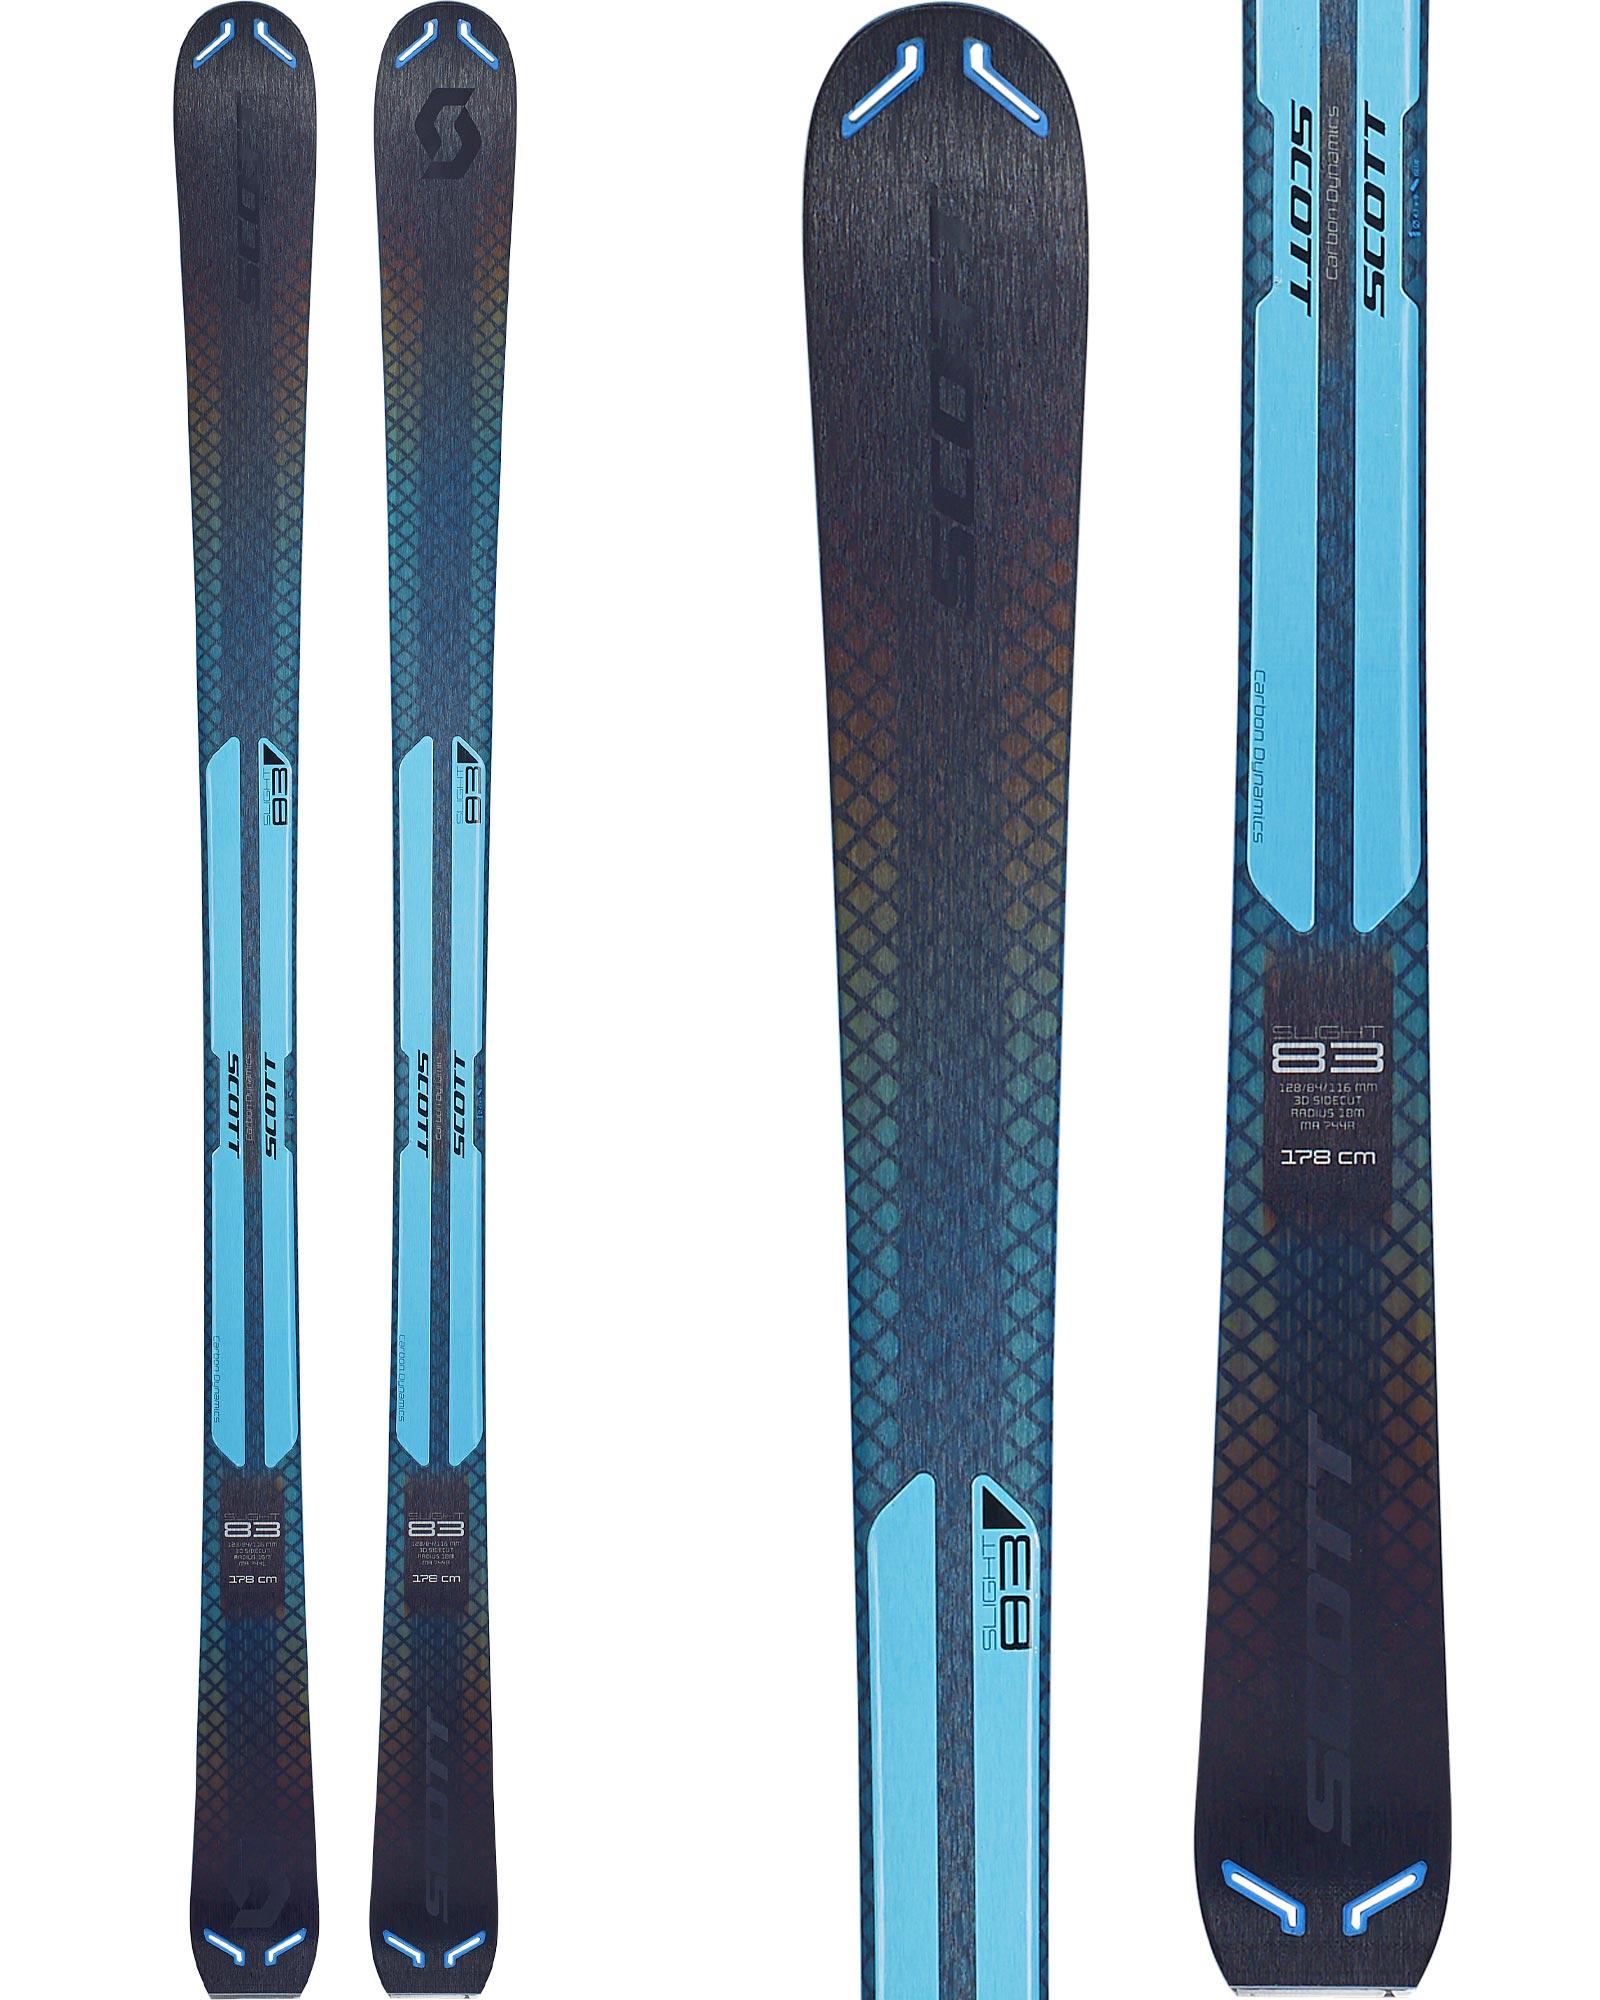 Scott Women's Slight 83 W All Mountain Skis 2018 / 2019 0